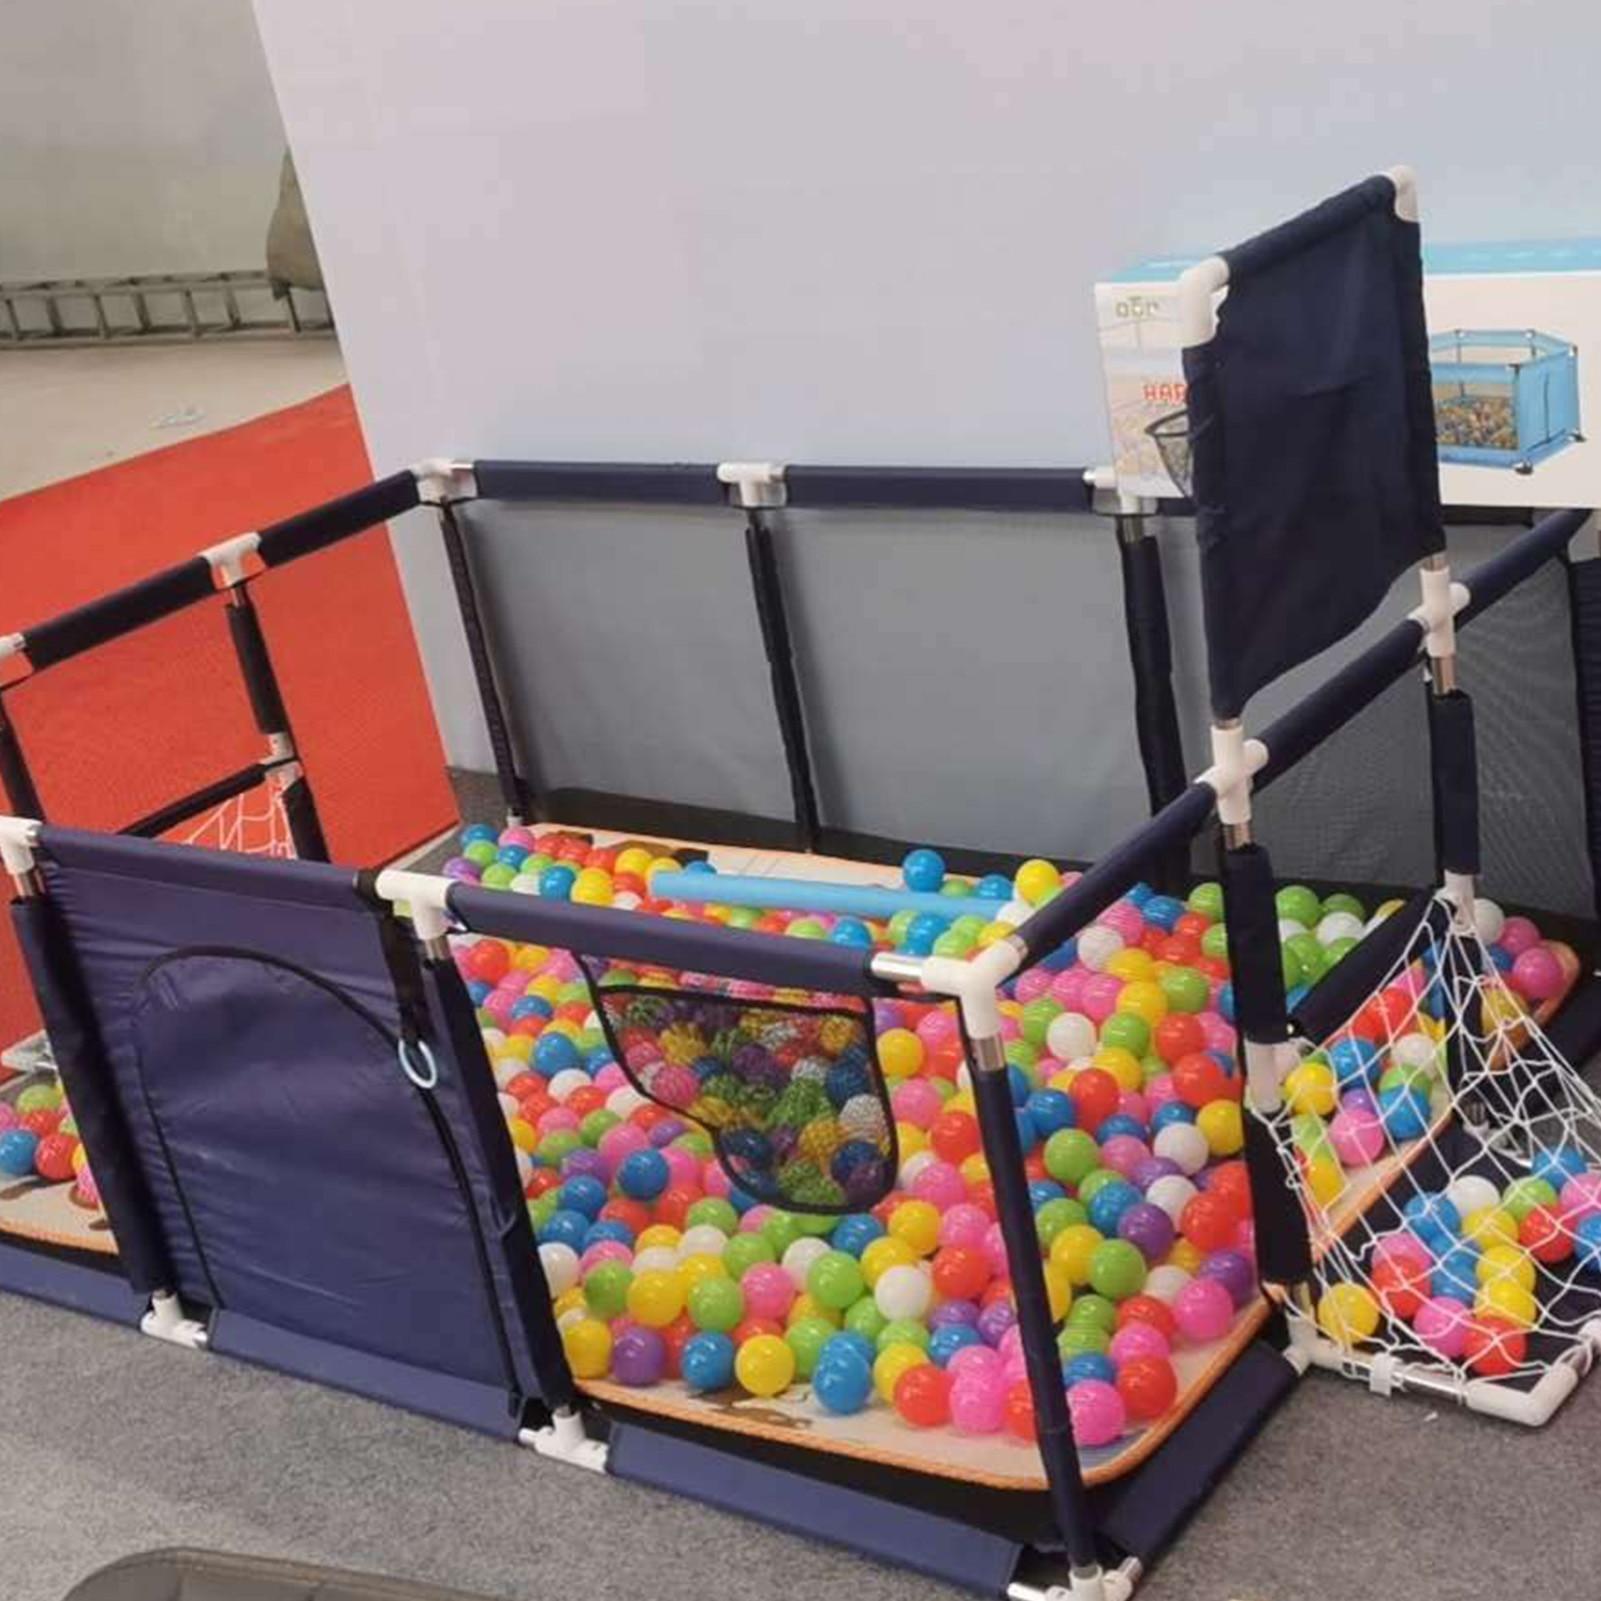 Big Children Playpen Kids Safety Pool Balls Barrier Baby Playpen For Child Pool Balls Newborn Fence Playpen For Baby Pool